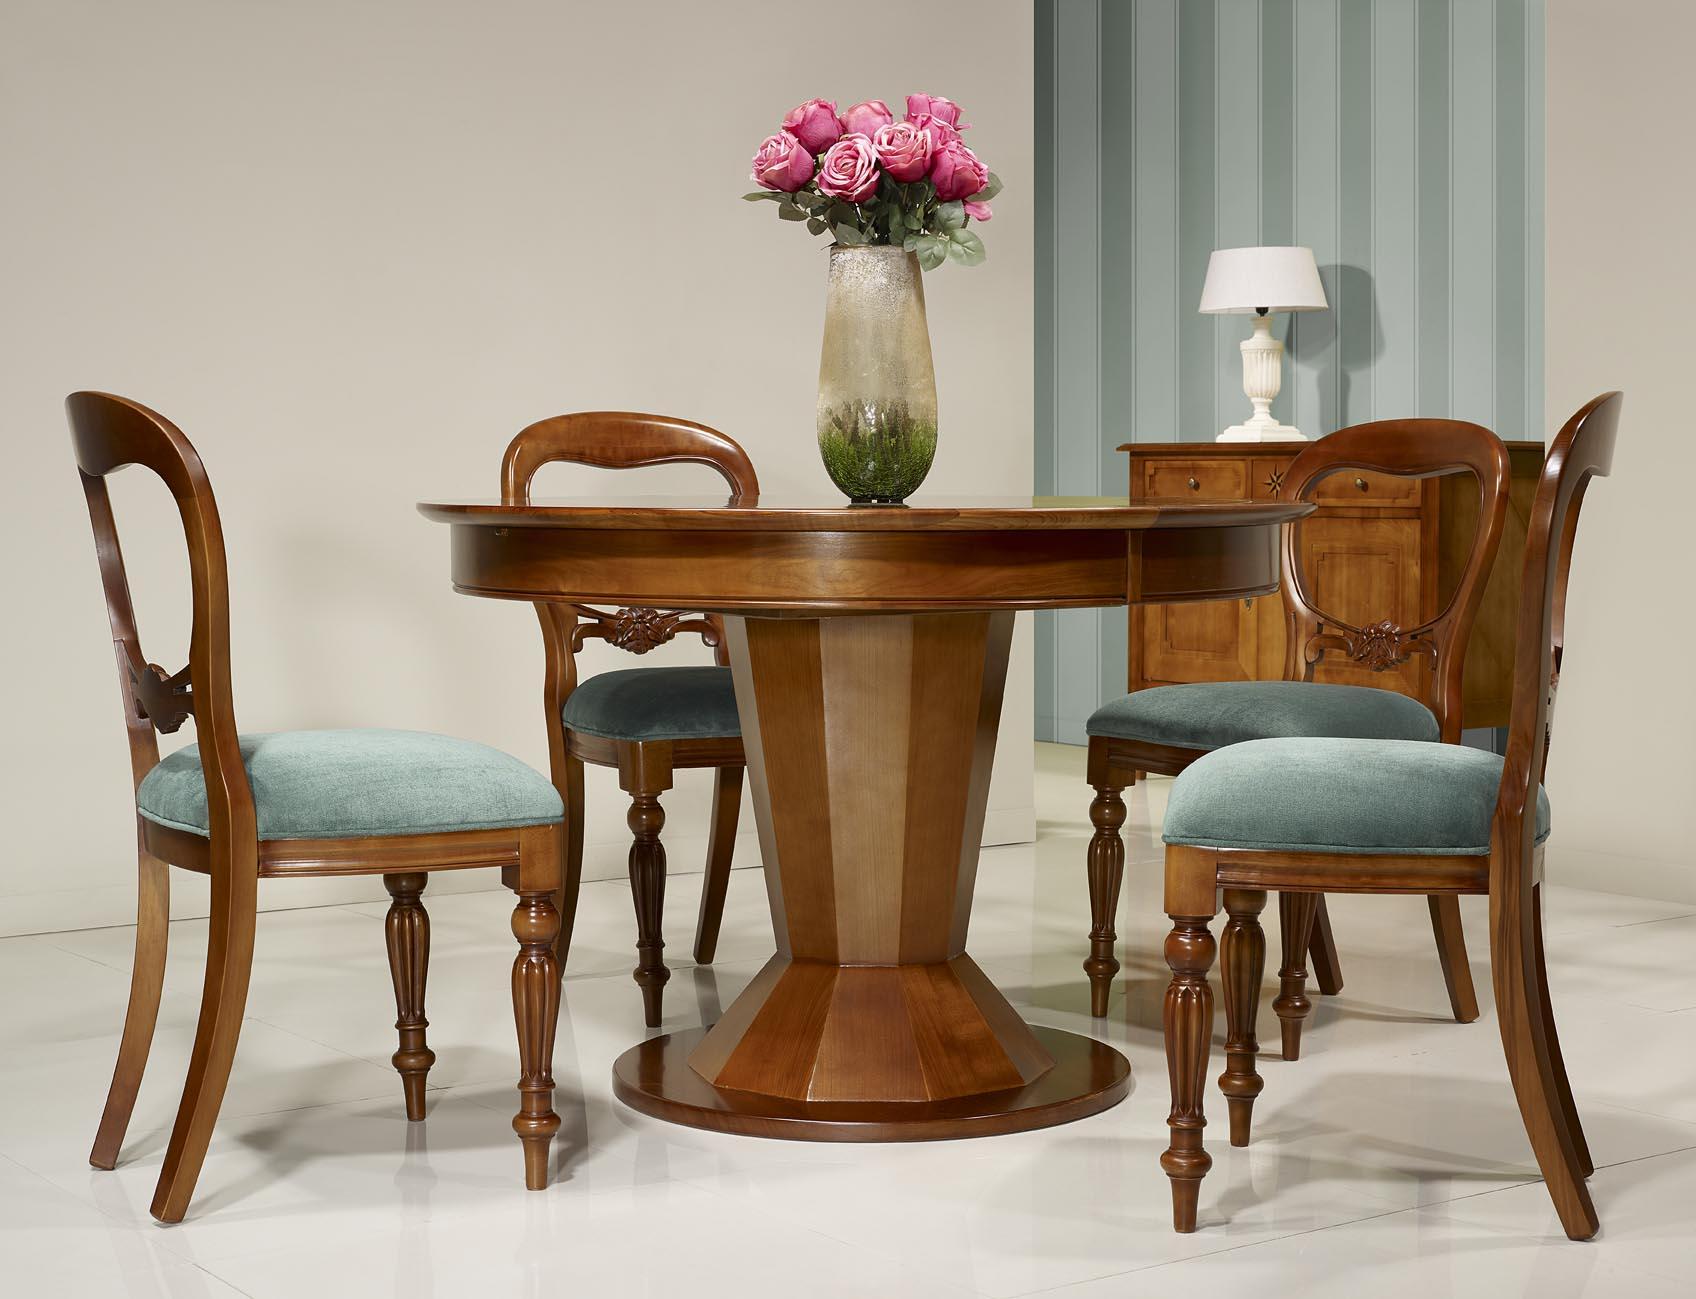 Table ronde pied central en merisier de style contemporain for Table ronde bois massif pied central